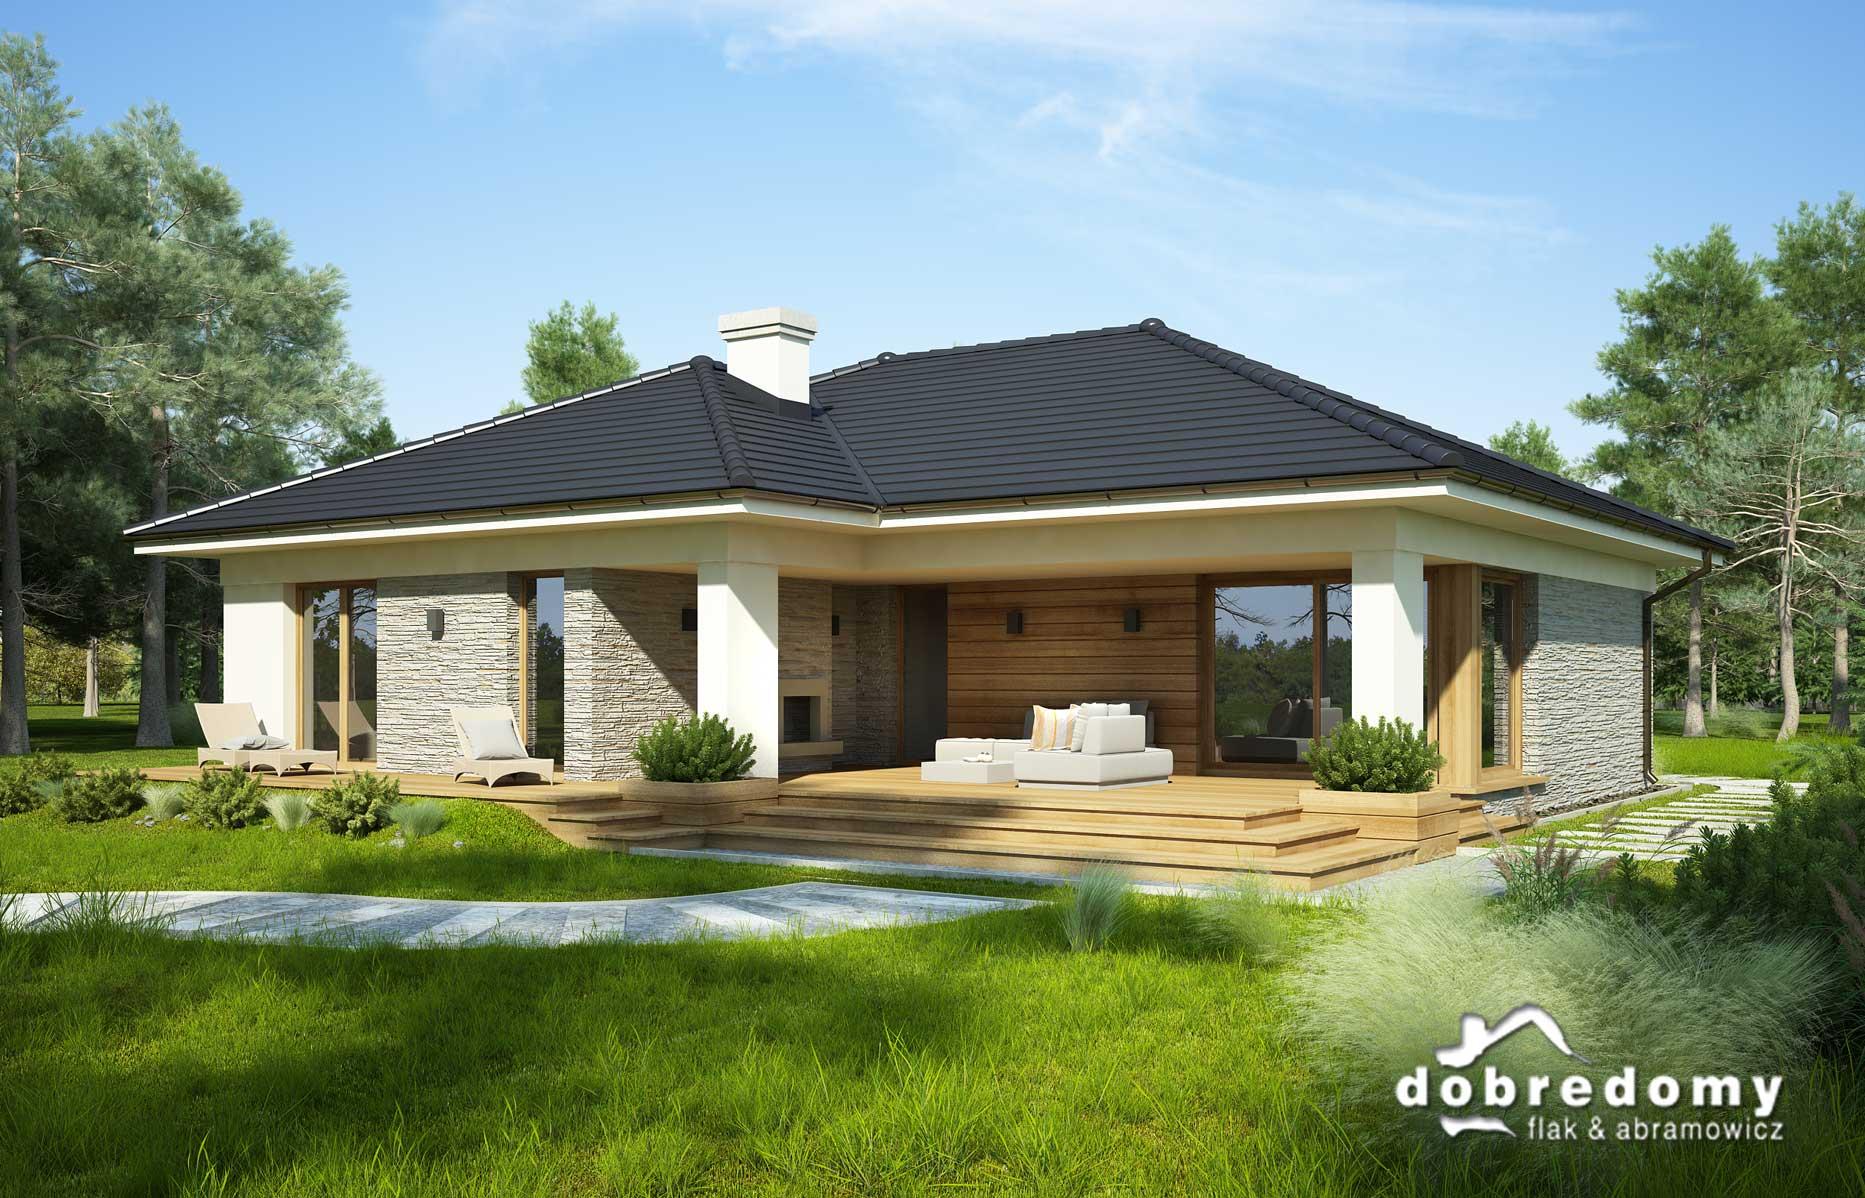 Oceania dobre domy flak abramowicz for Casas y cosas